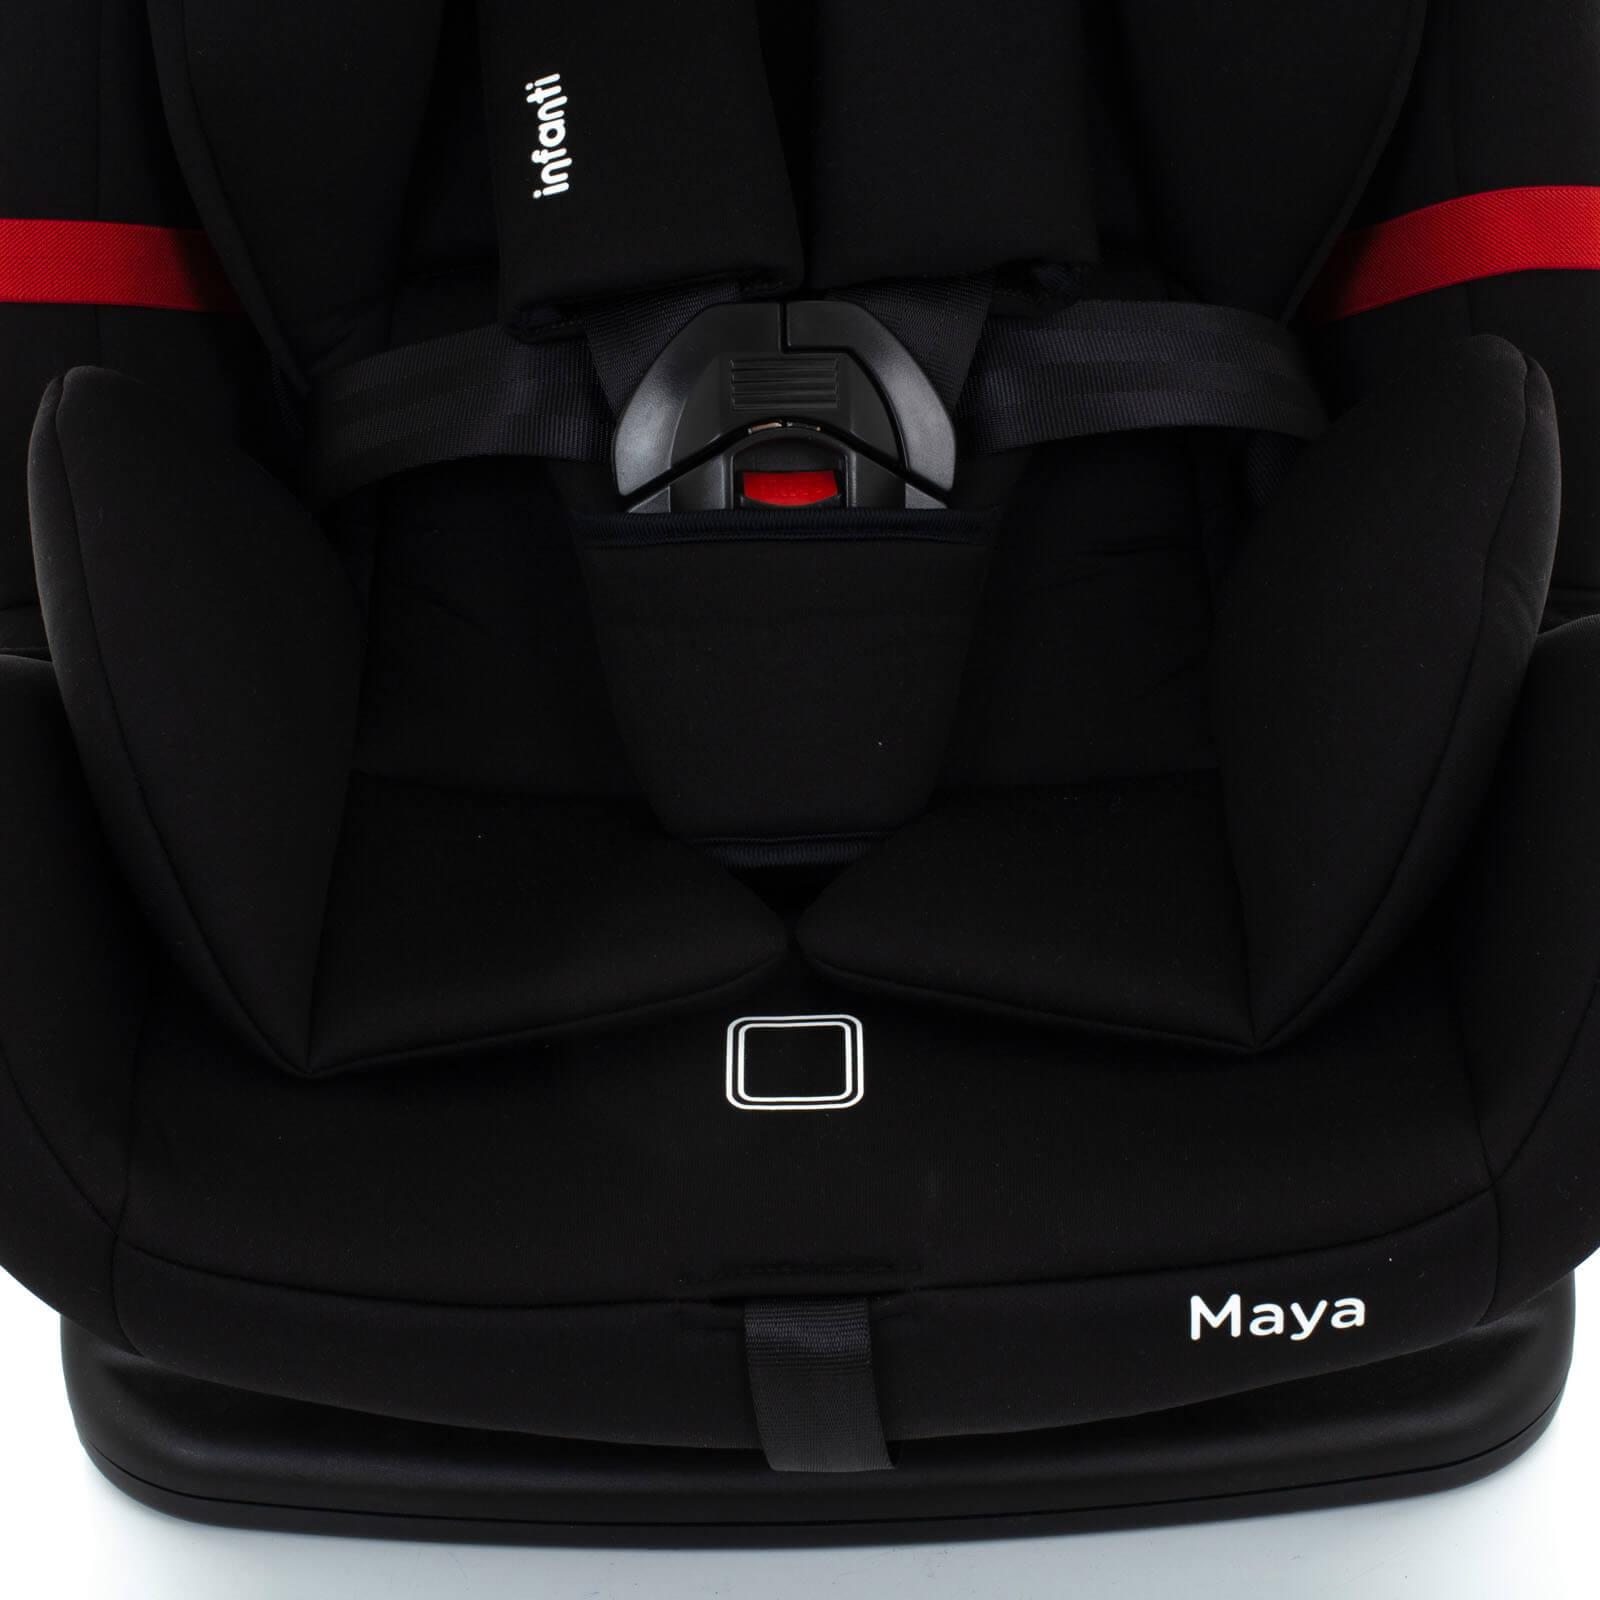 Cadeirinha Maya Black Storm - Infanti IMP01434